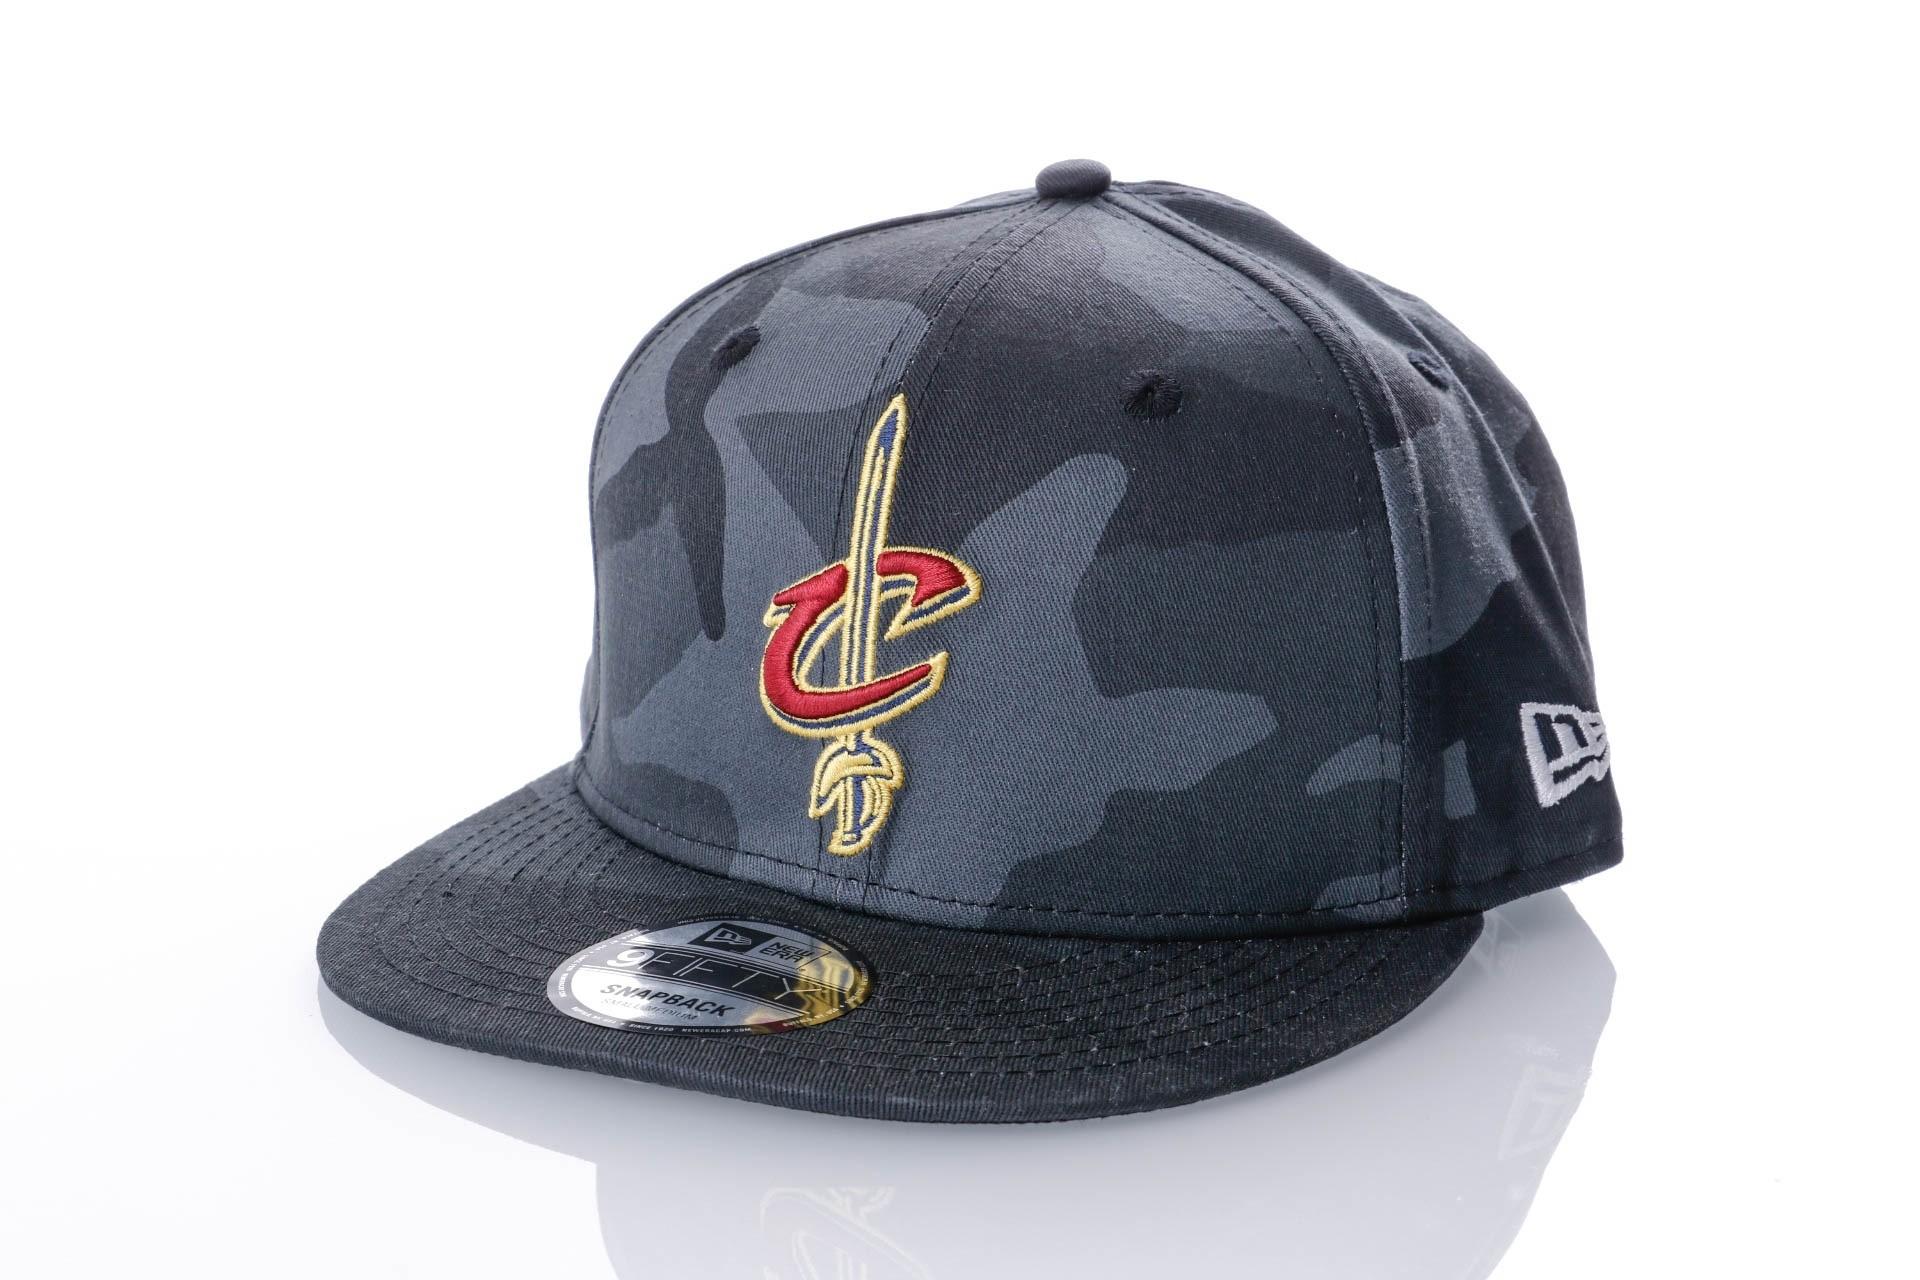 Afbeelding van New Era CAMO COLOR 9FIFTY CLEVELAND CAVALIERS 80636094 Snapback cap MIDNITE CAMO MLB